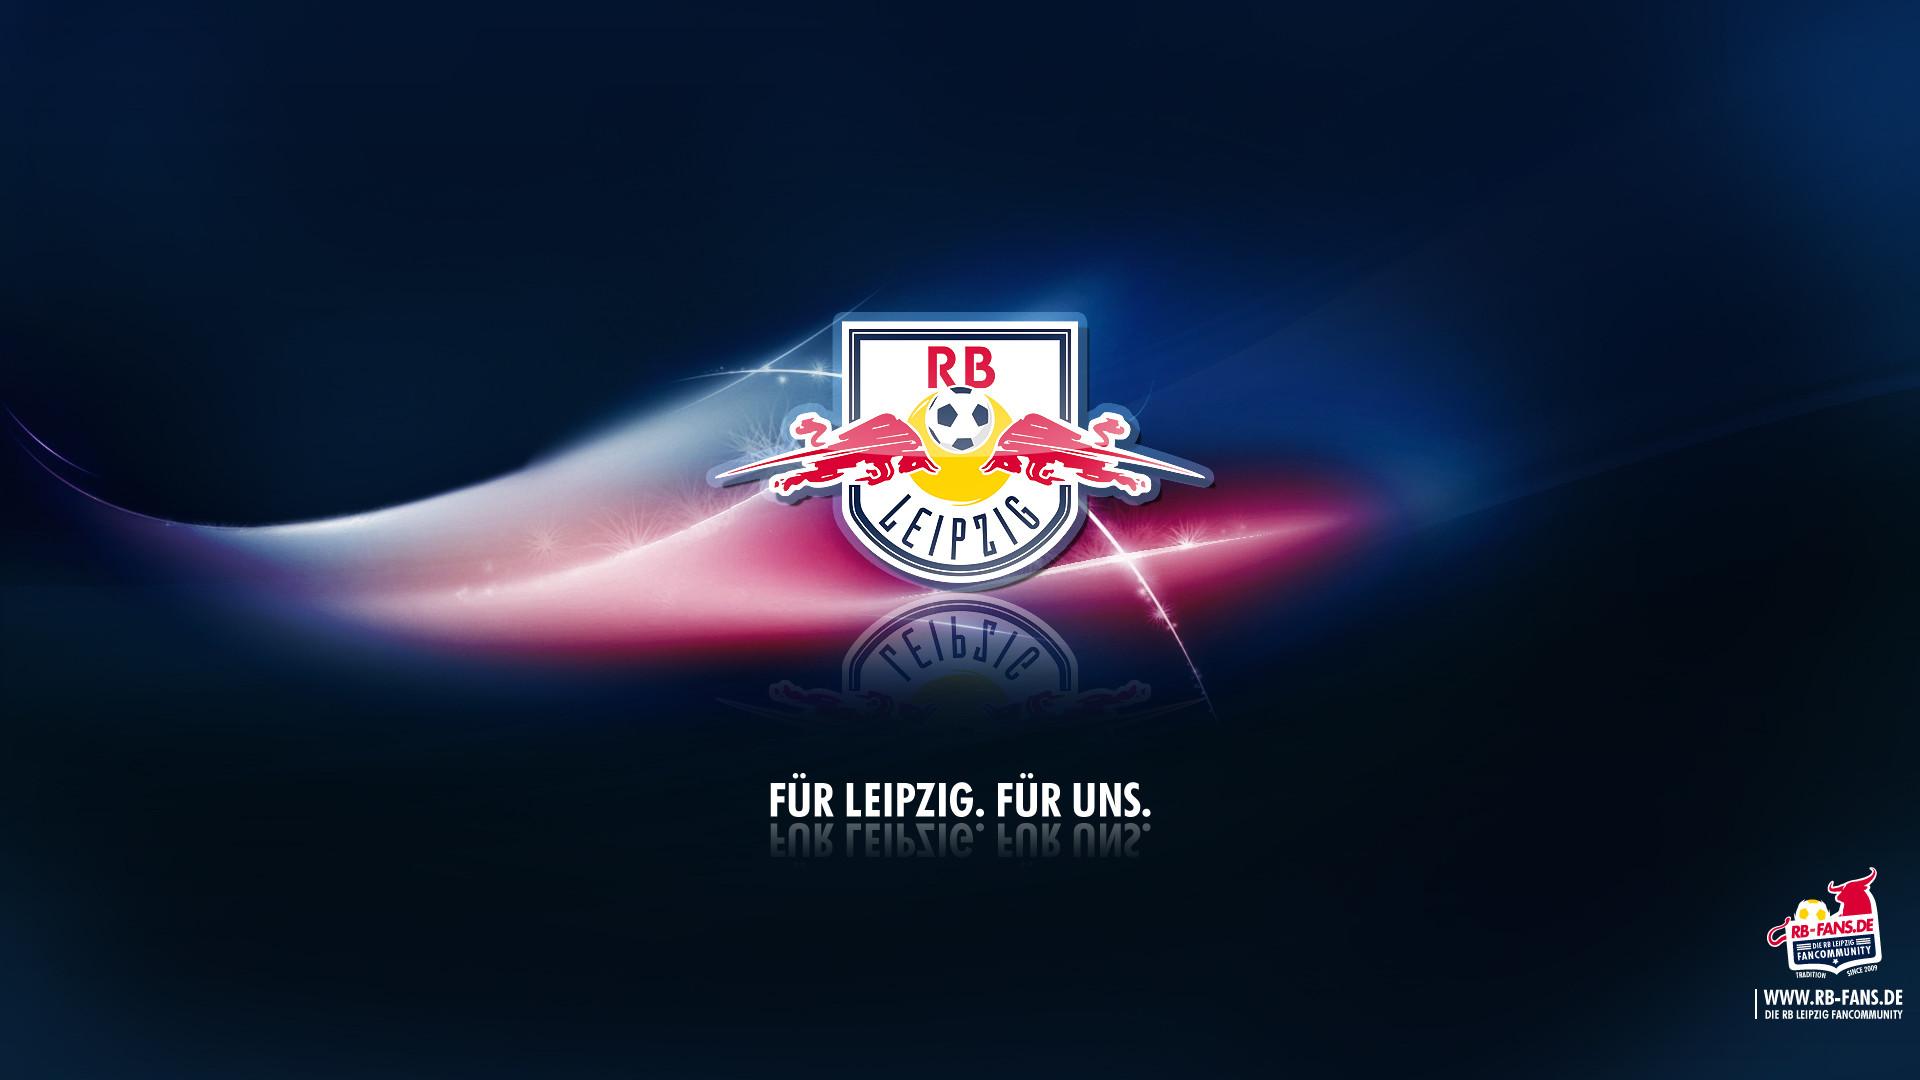 Rbl München